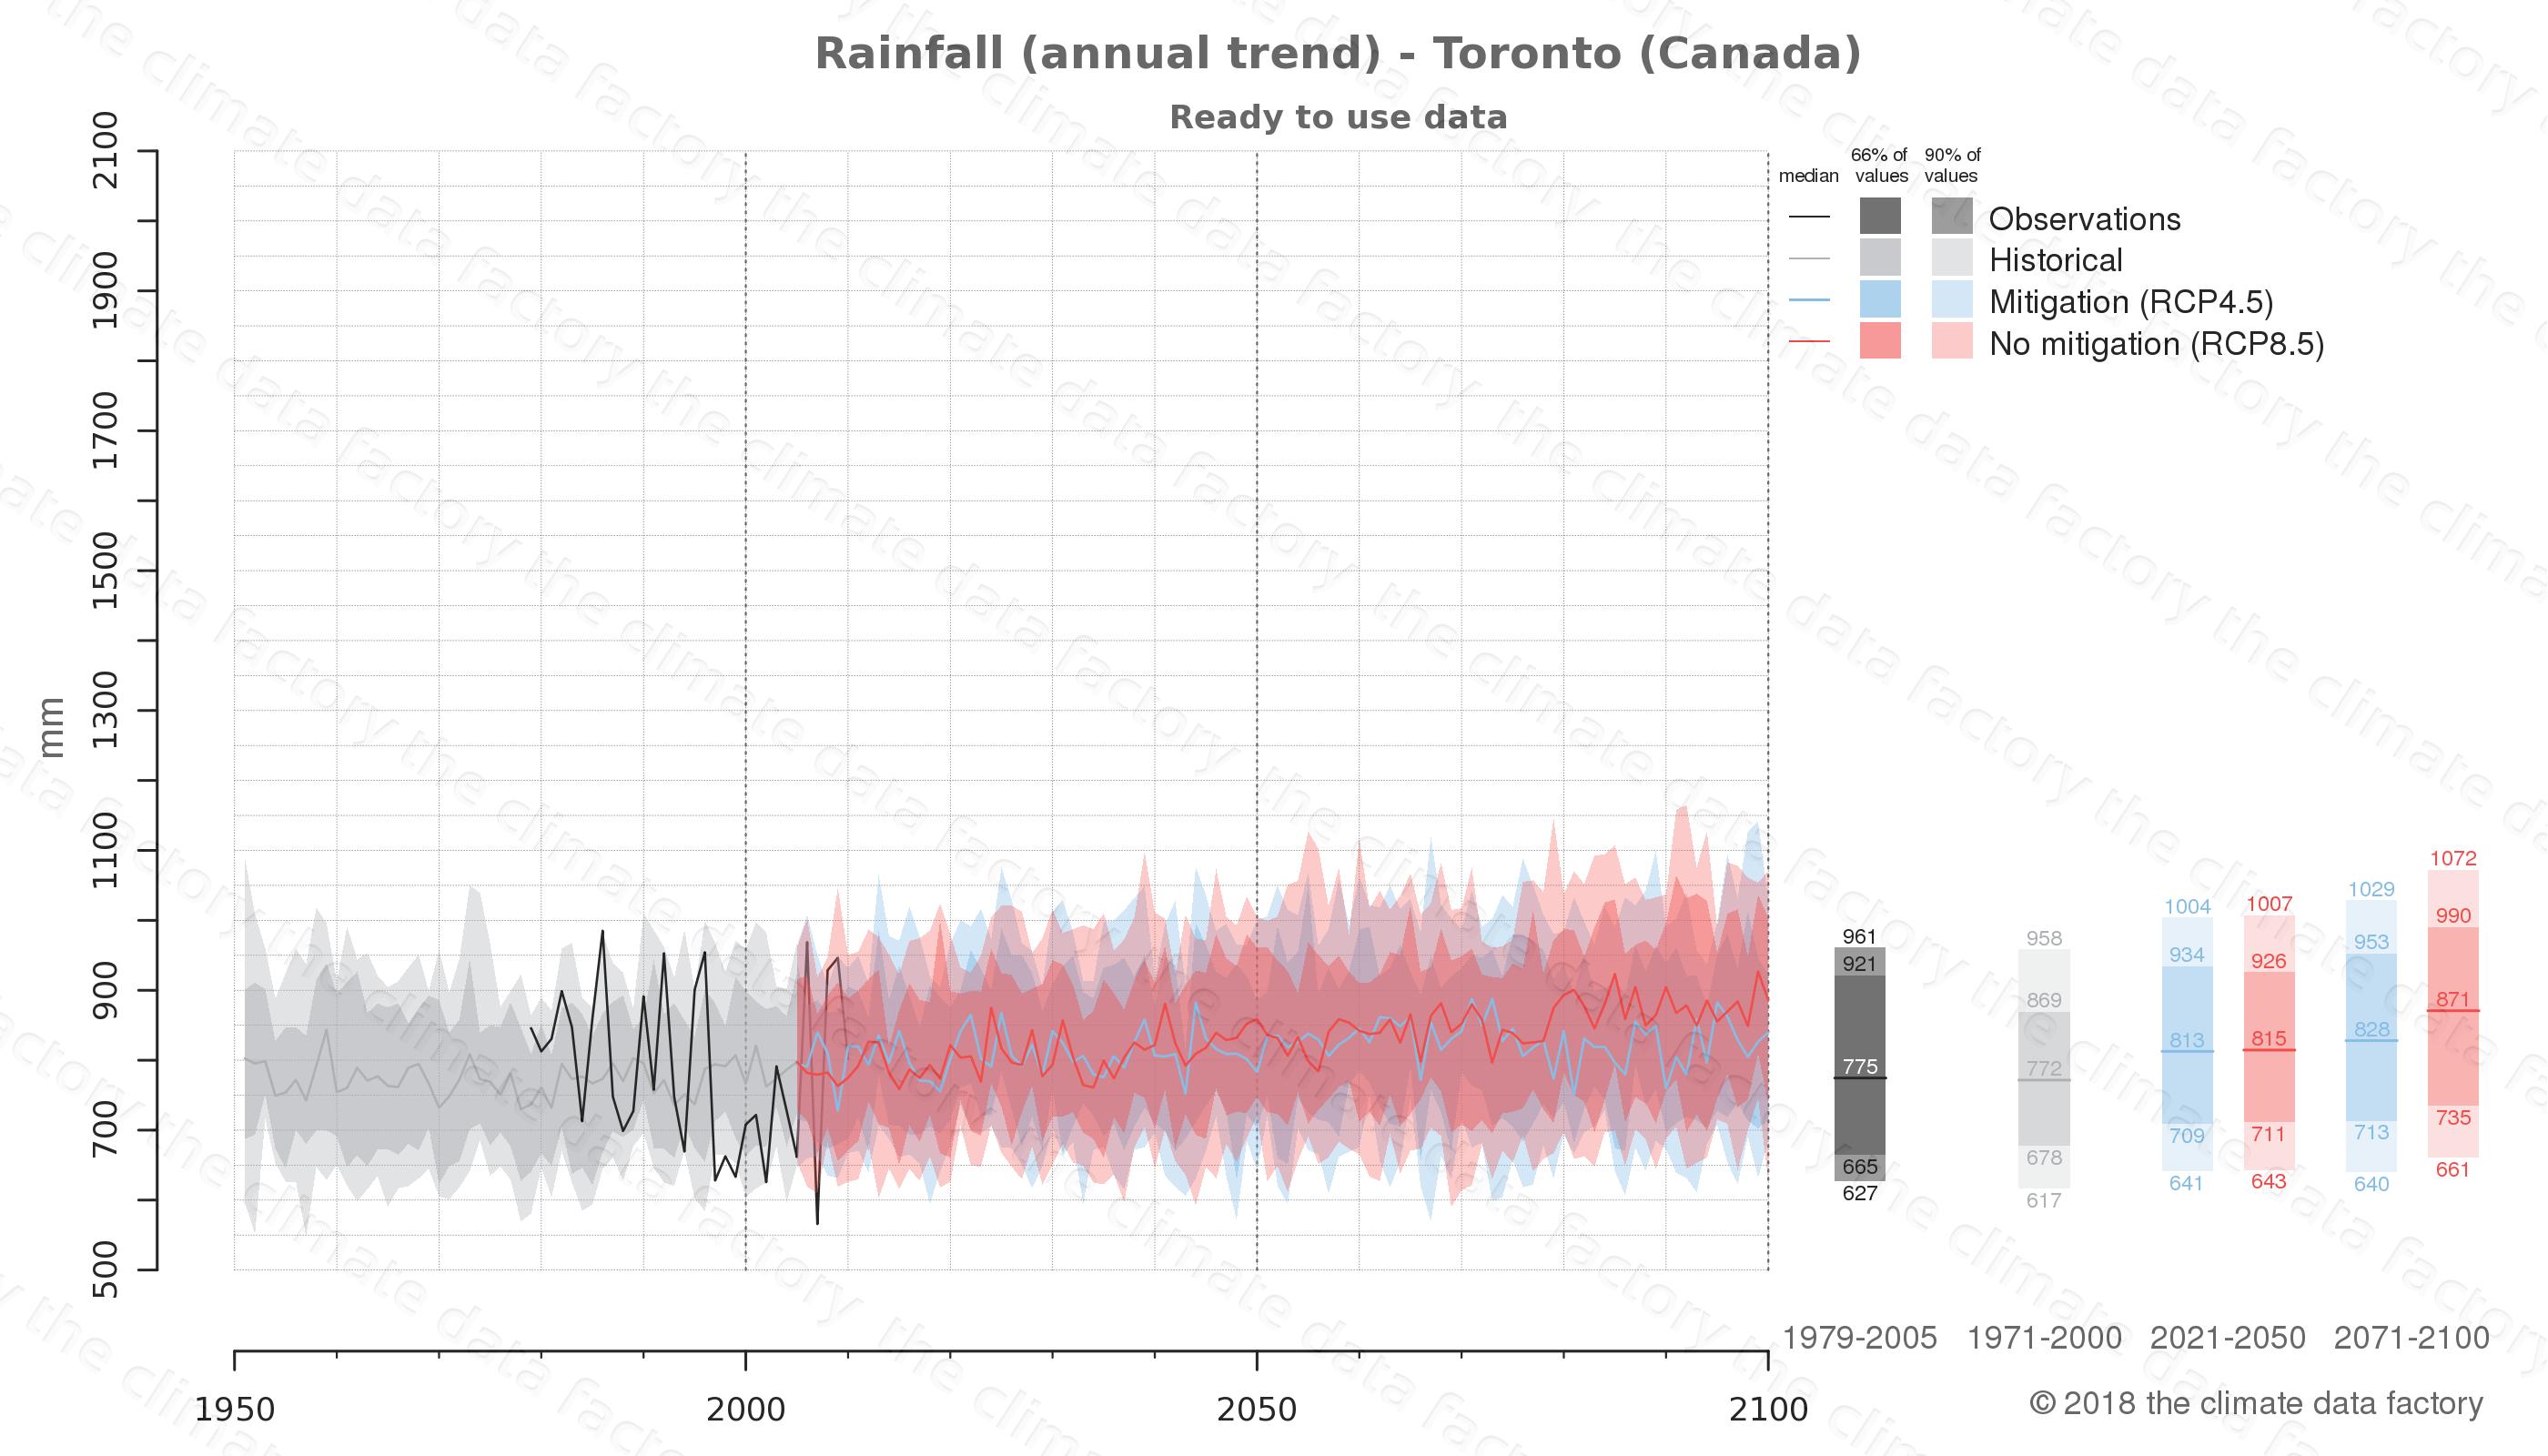 climate change data policy adaptation climate graph city data rainfall toronto canada